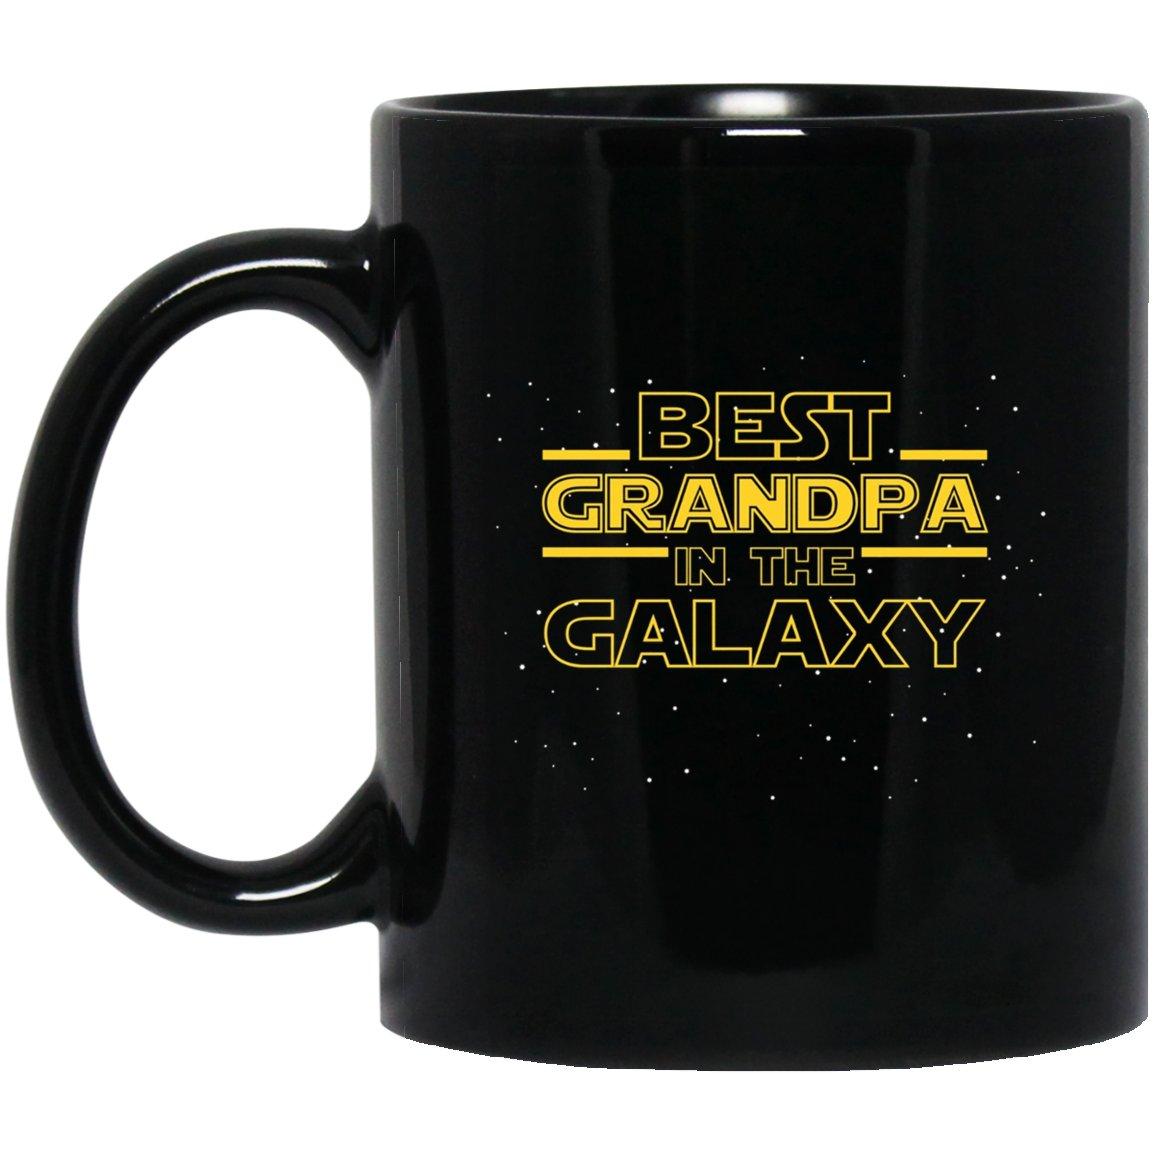 Mens Best Grandpa in the Galaxy, Funny Grandpa Gift Black  Mug Black Ceramic 11oz Coffee Tea Cup